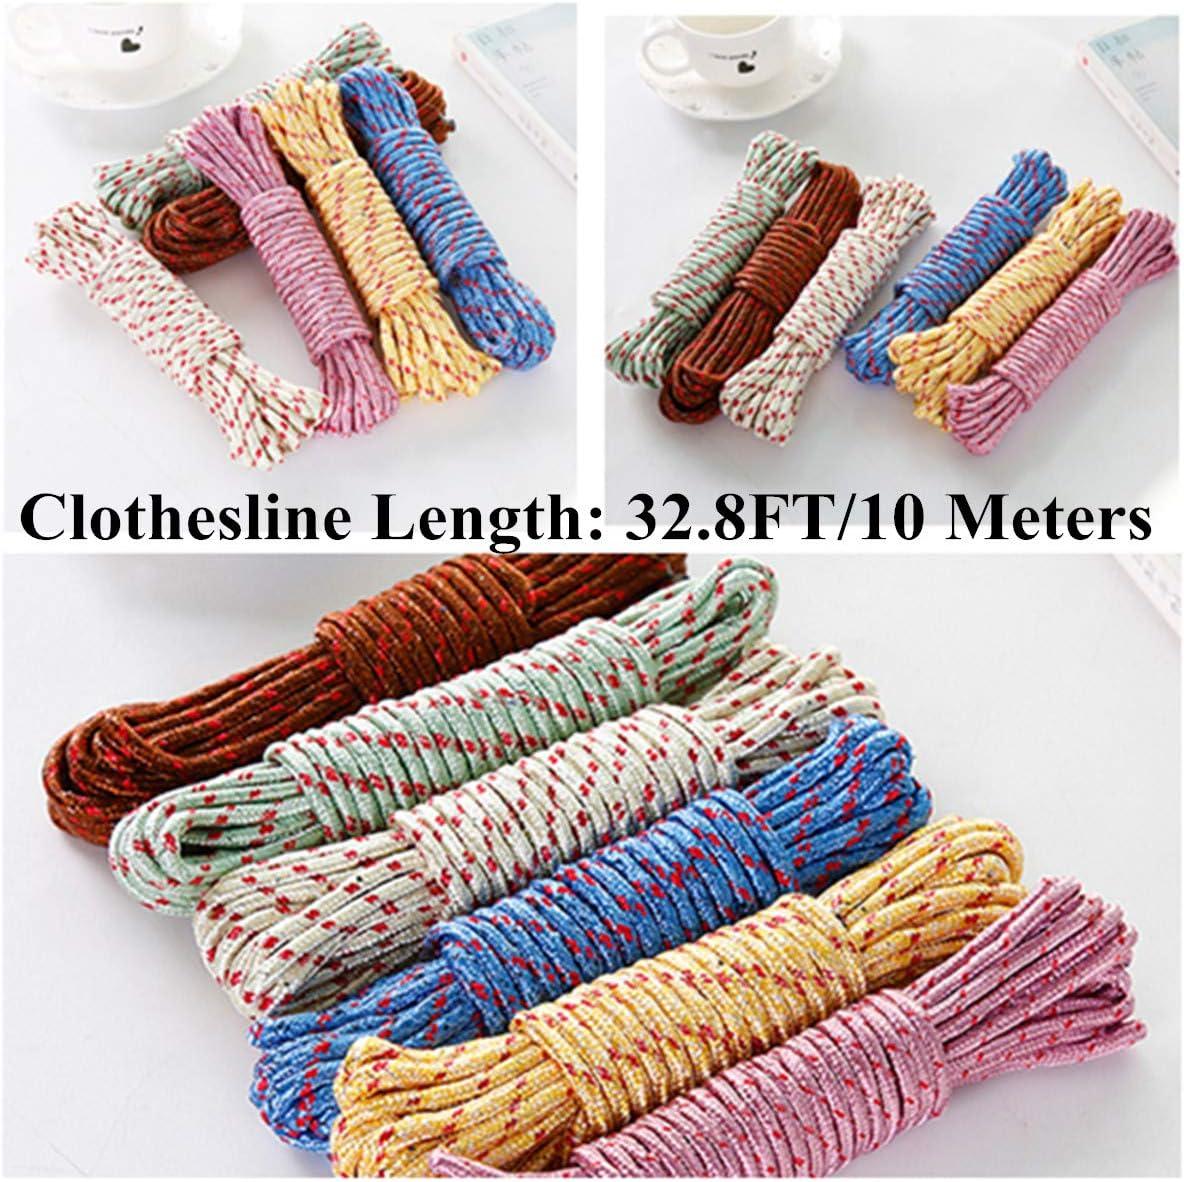 DFC9 Ropes Nylon Rope Lash Clothesline Camping Tarp Ropes Belt Nylon Camping